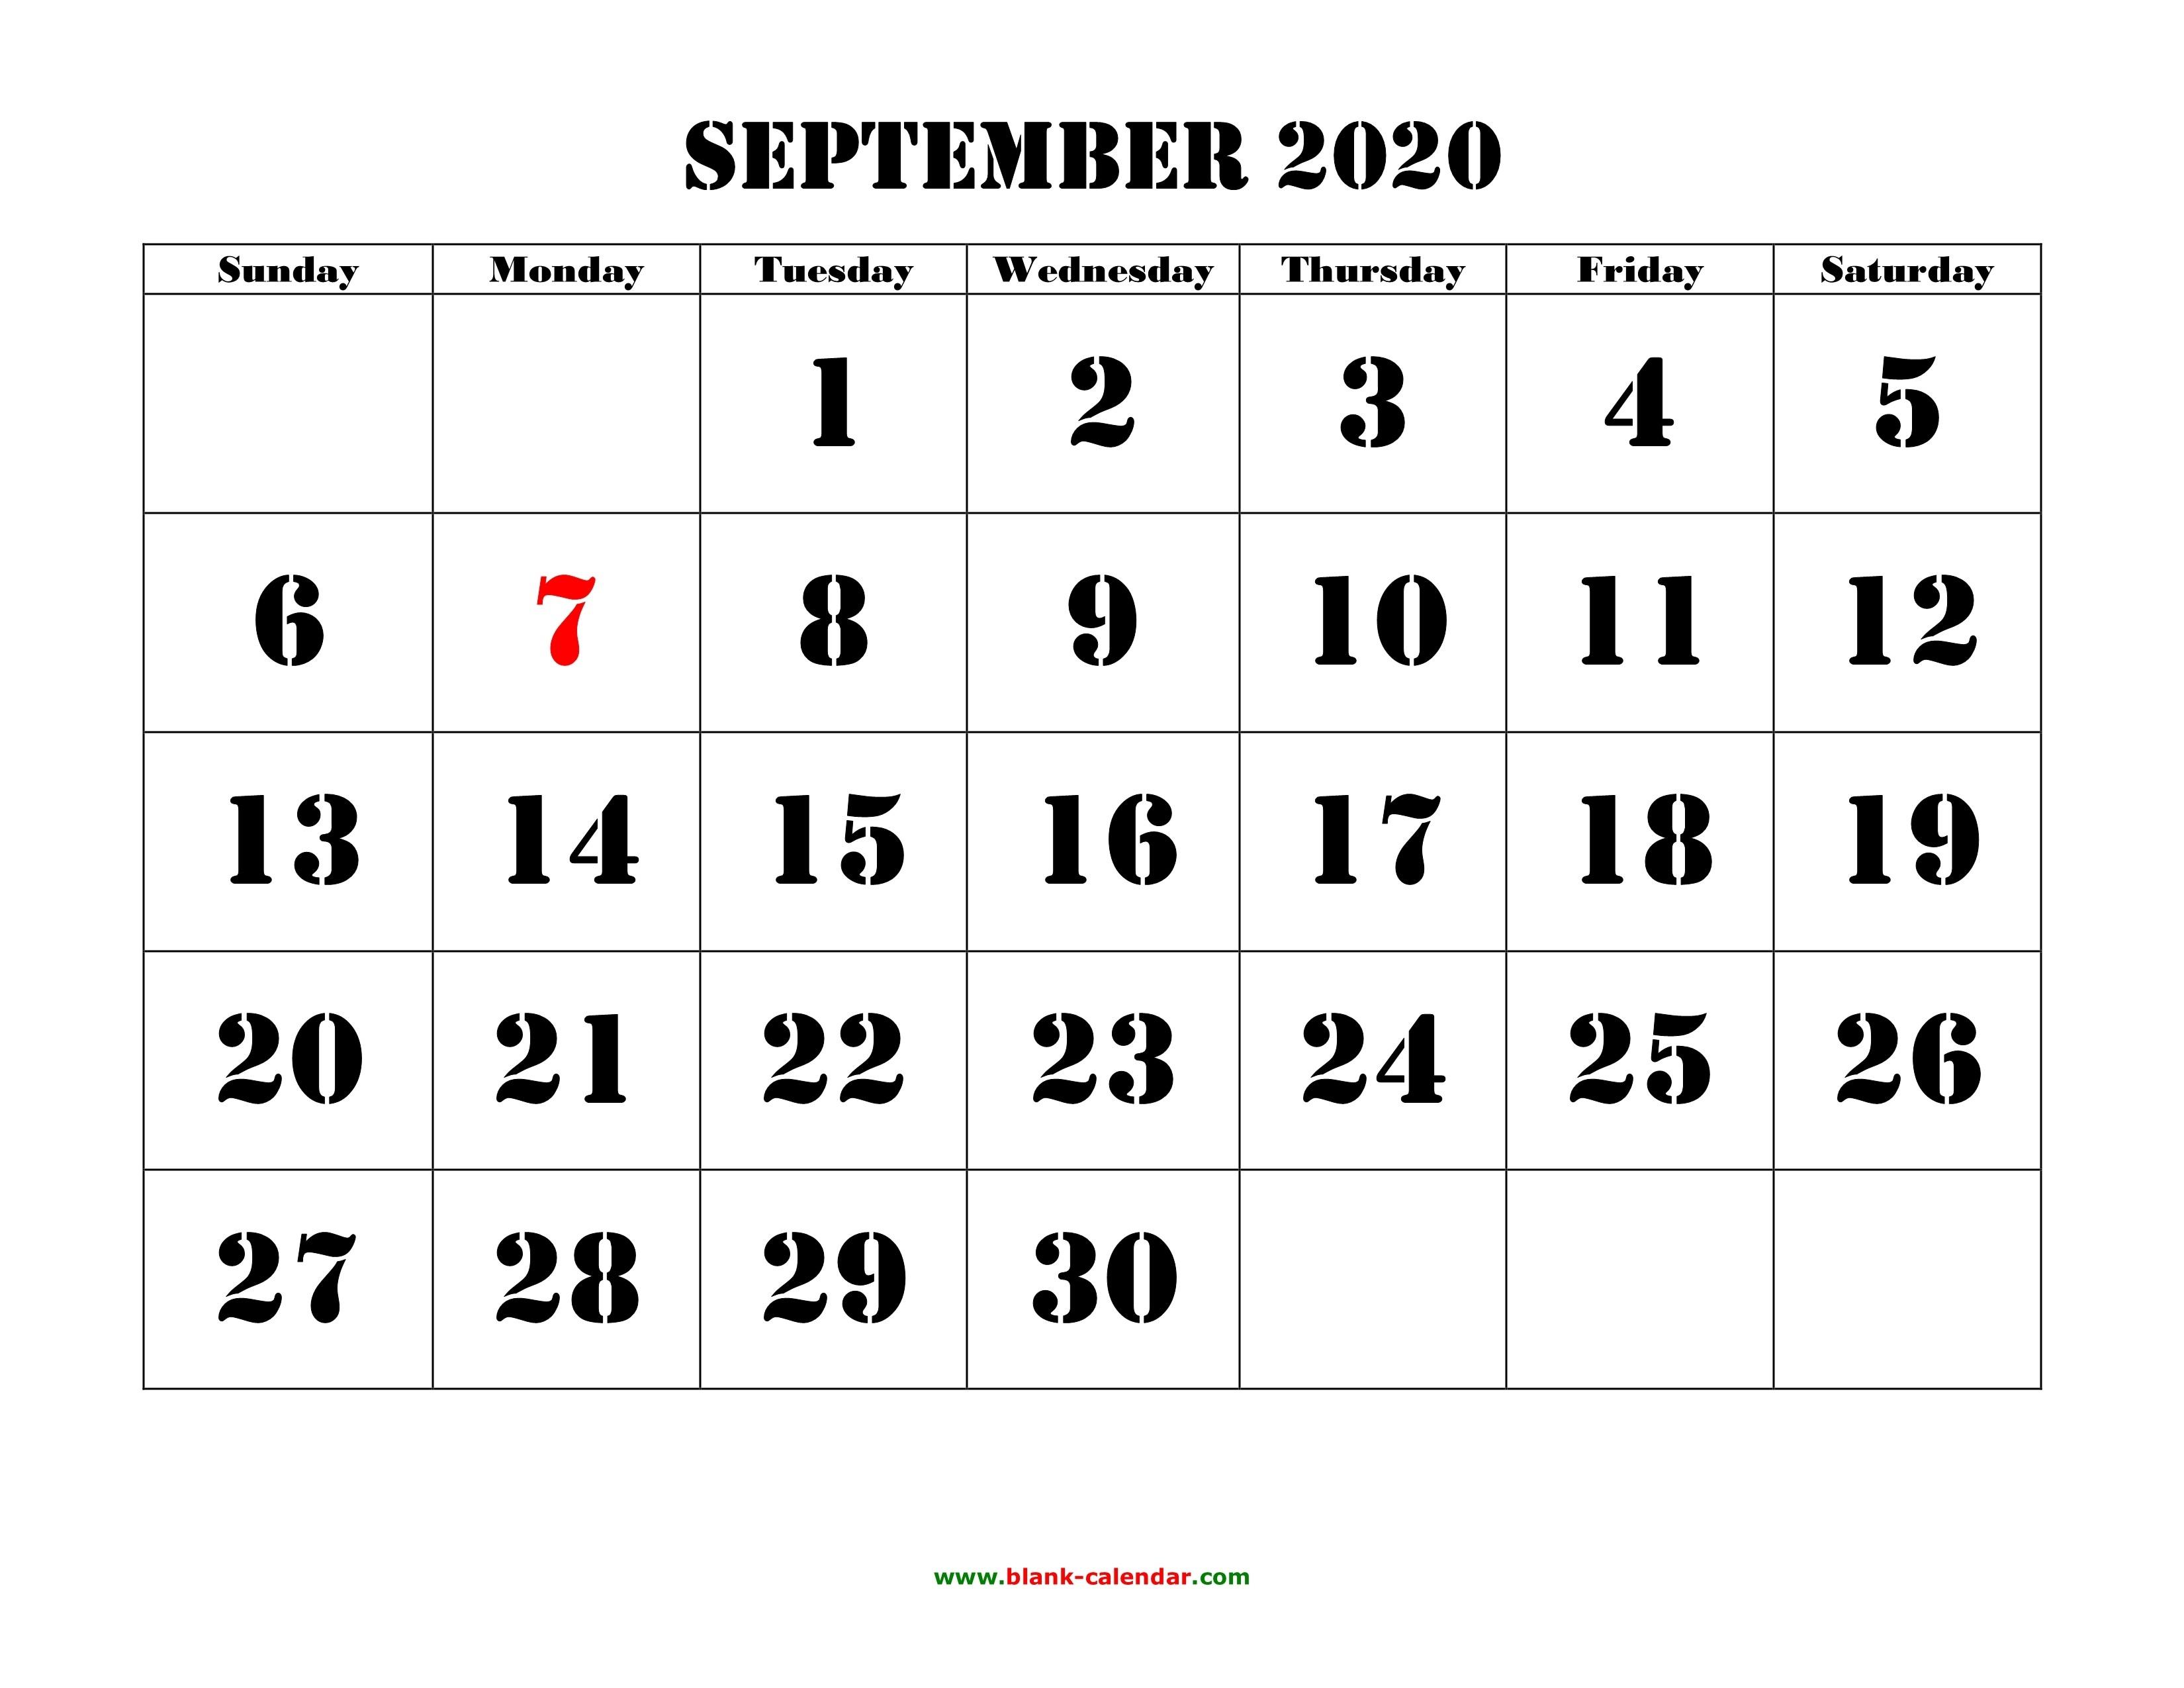 September 2020 Printable Calendar | Free Download Monthly-Google Calendar September 2020 Template